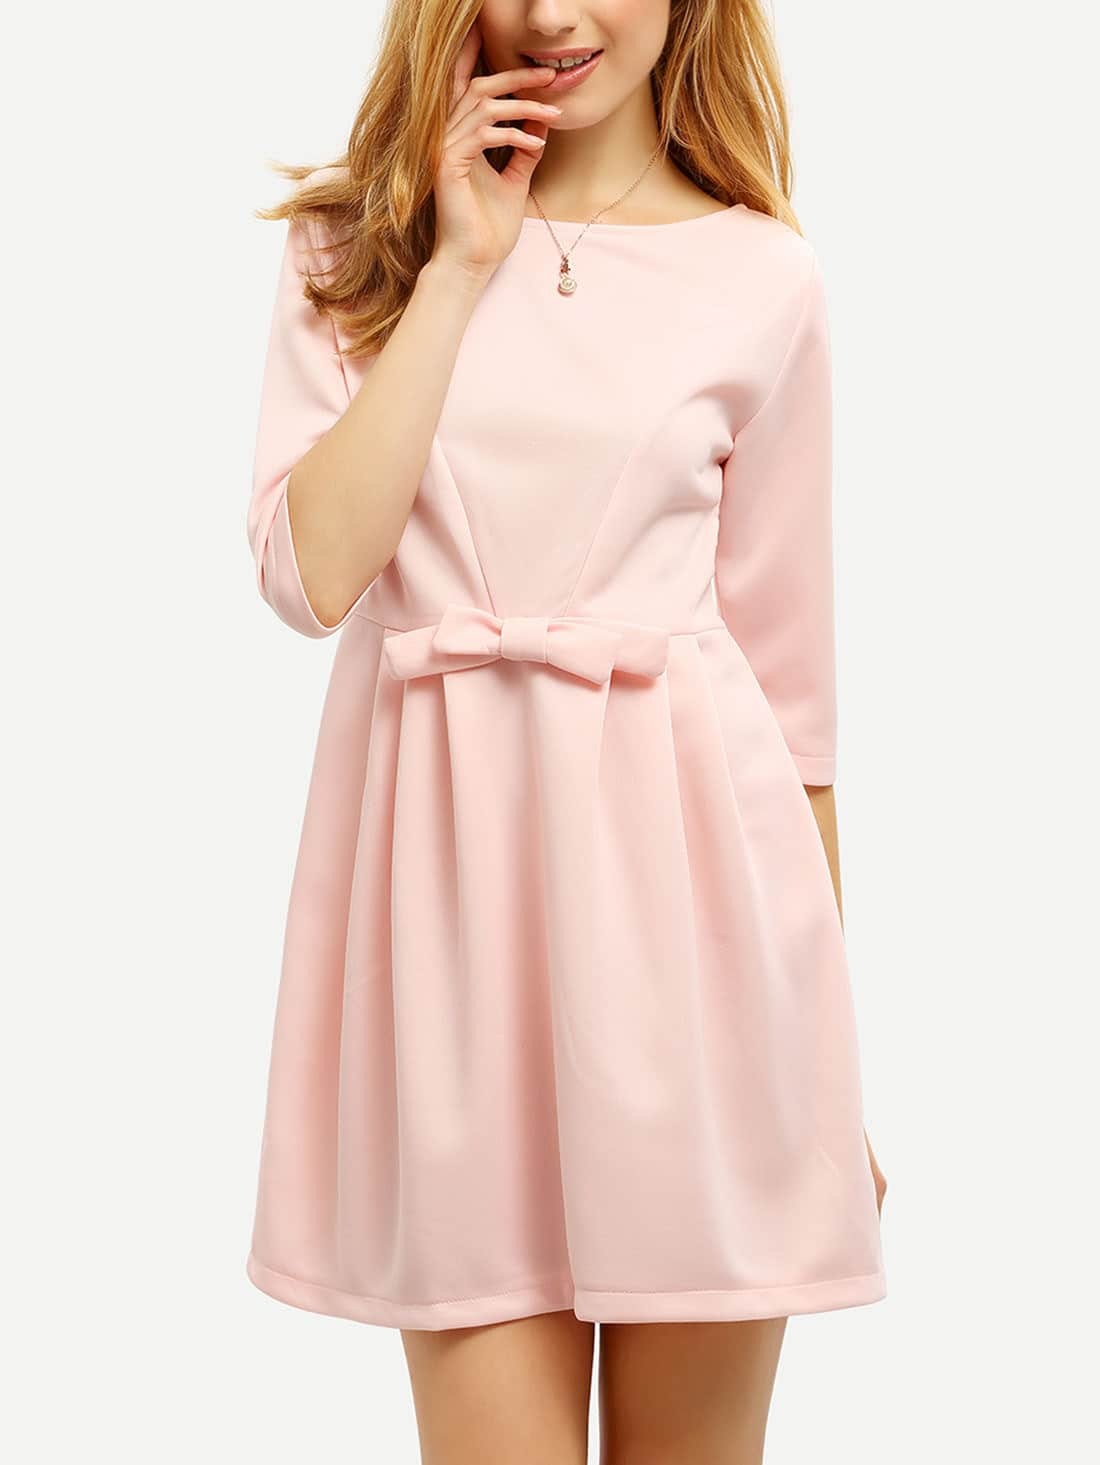 Pink Bow Half Sleeve DressPink Bow Half Sleeve Dress<br><br>color: Pink<br>size: L,M,XL